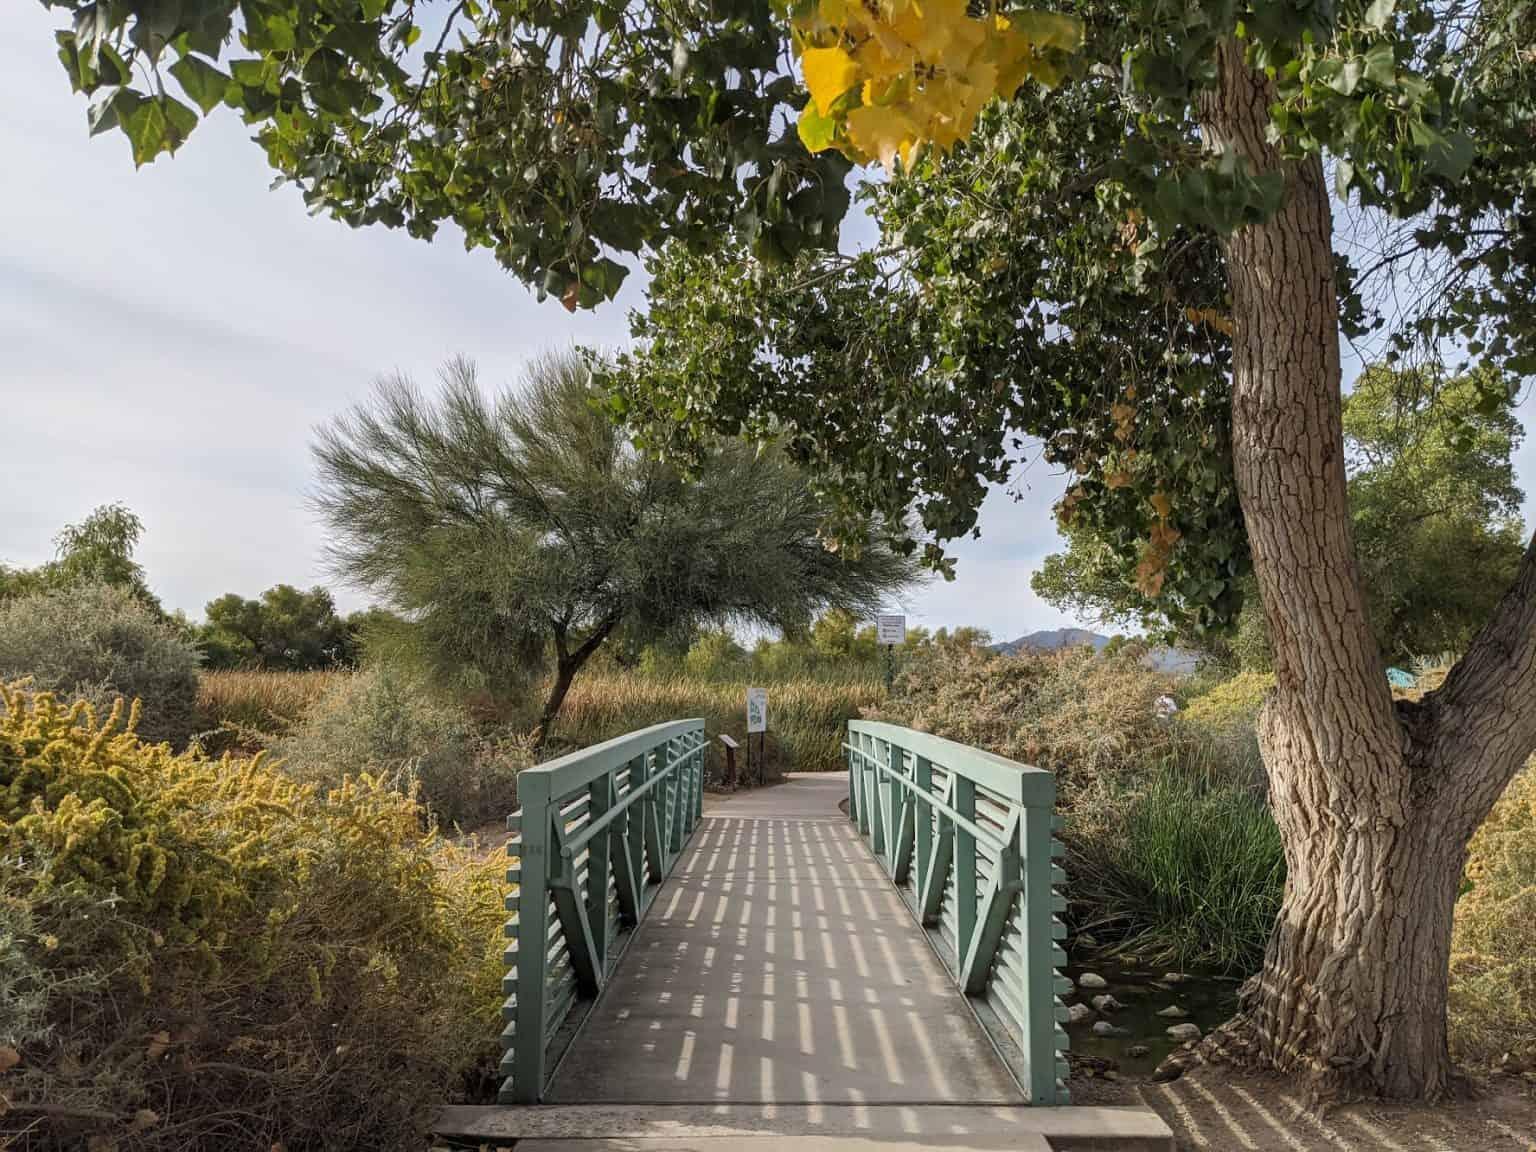 green bridge among changing trees at sweetwater wetlands park in tucson arizona